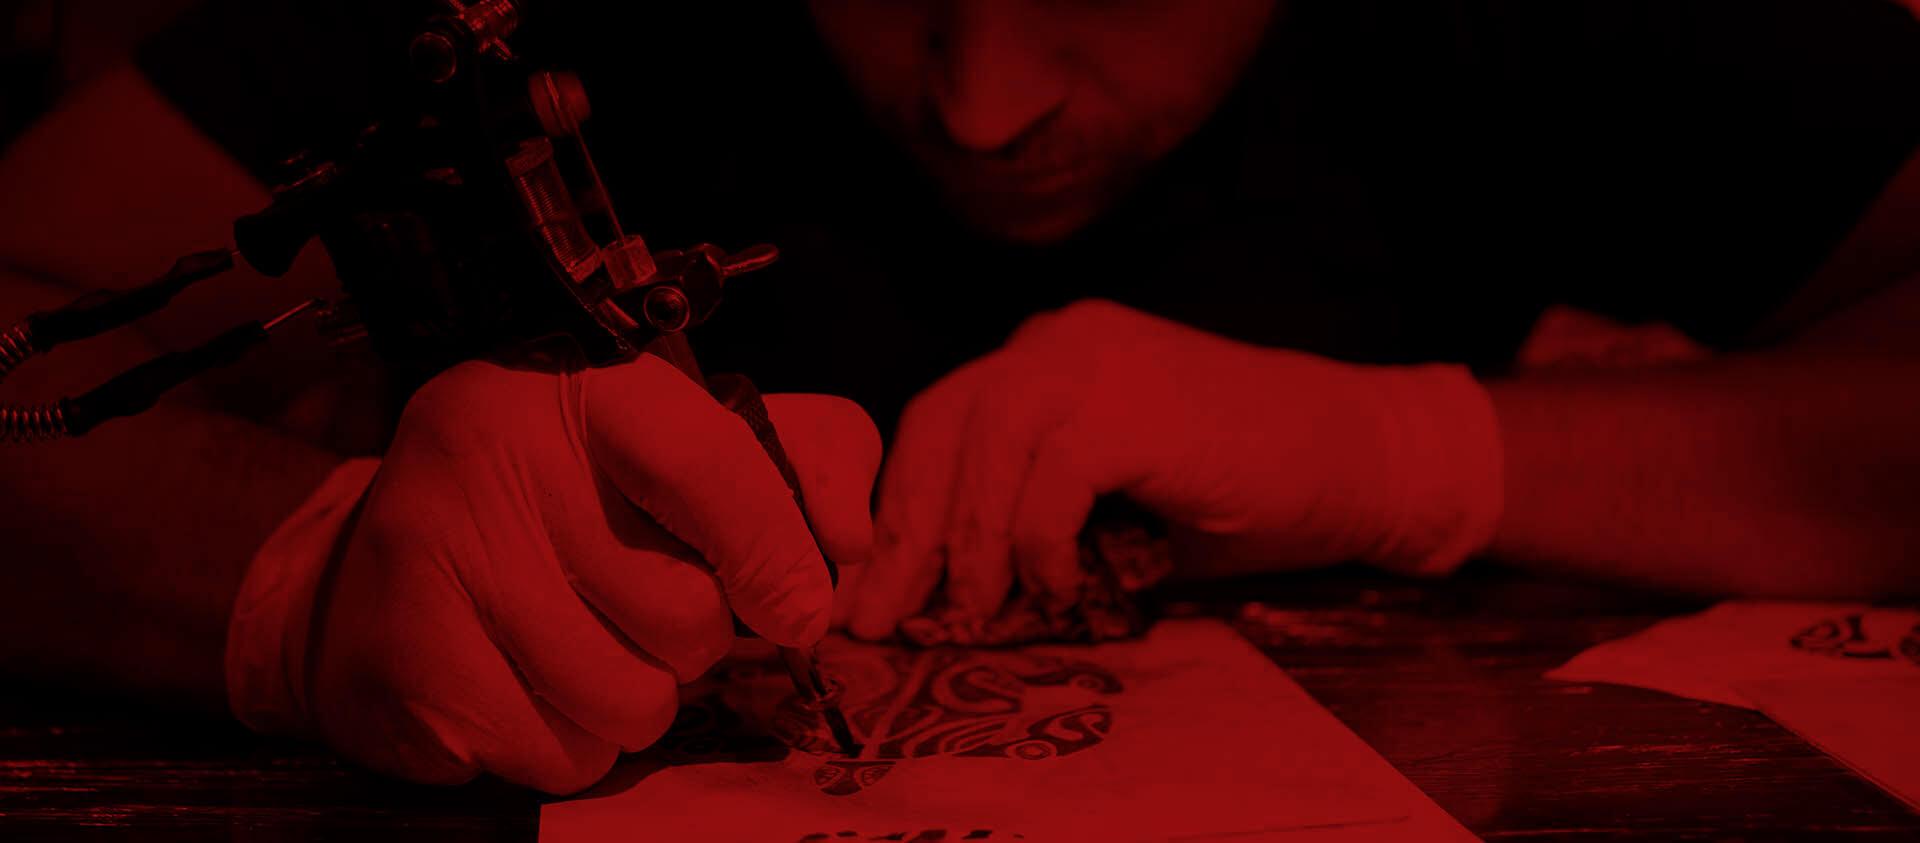 Curso De Tatuador Curso De Tatuaje Eomtp Escuela De Tatuajes